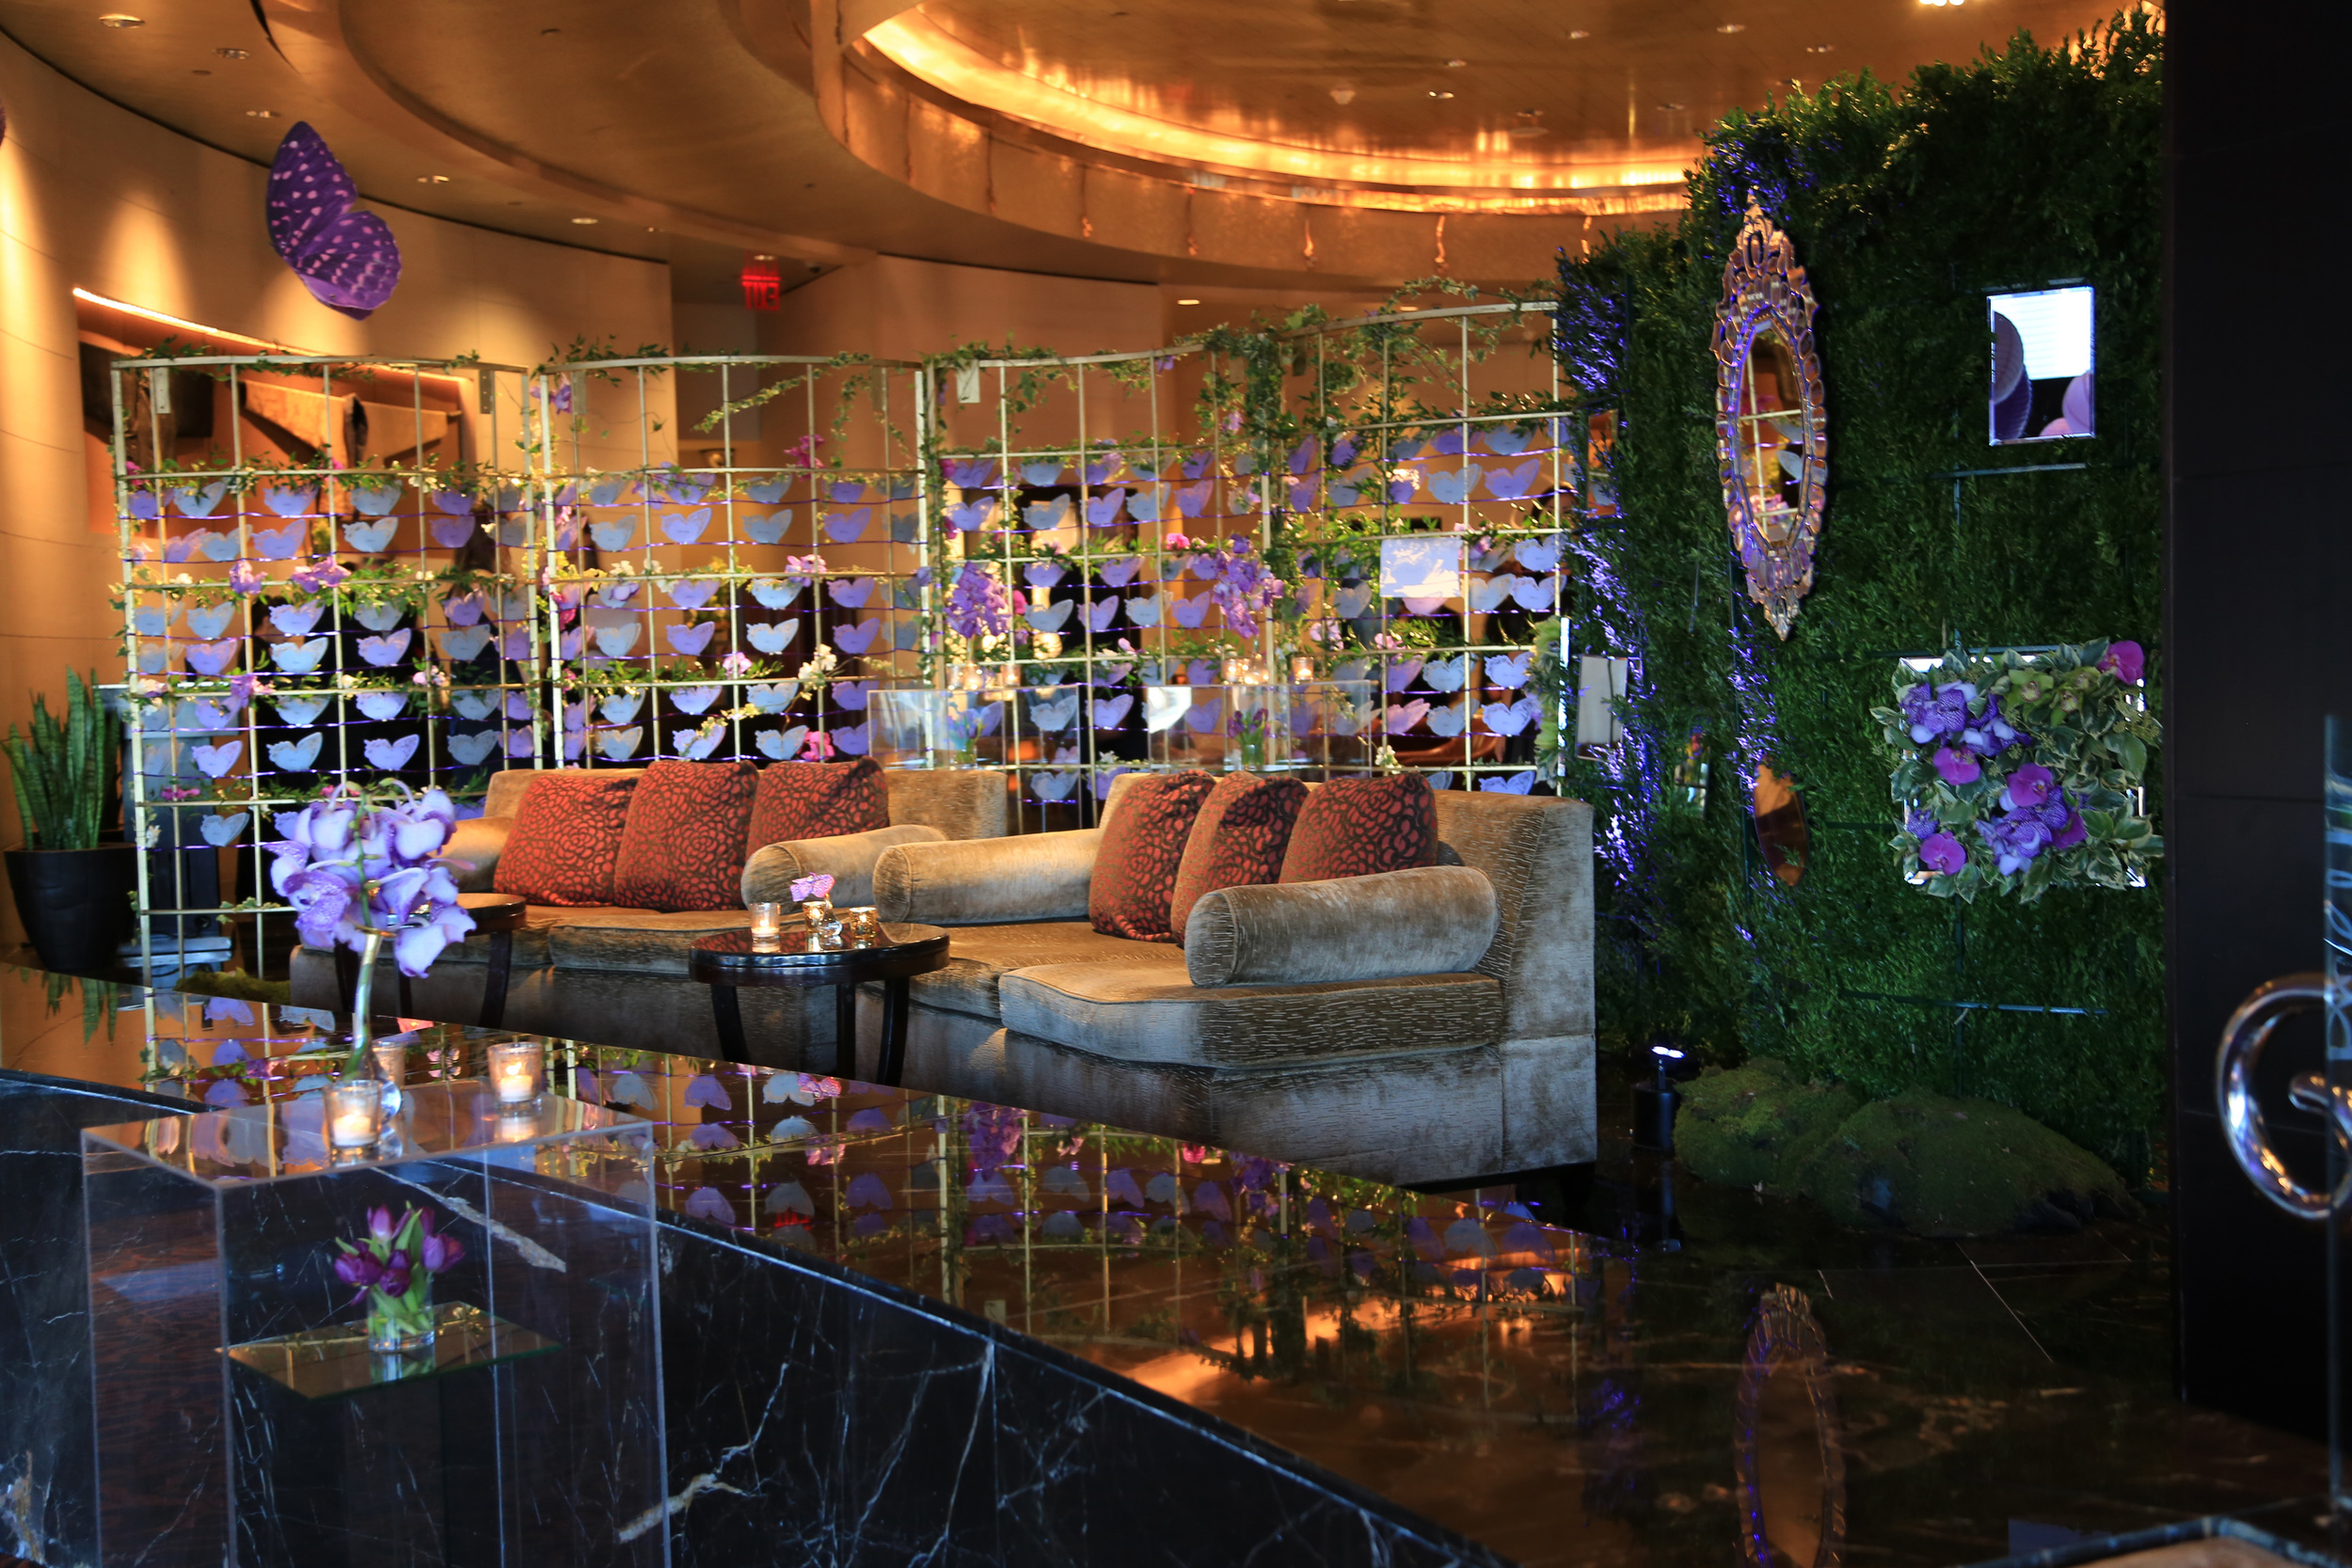 mandarin_oriental_new_york_city_branding_inspiration_lavender_silver_wedding_floral_purple_v284_20.jpg